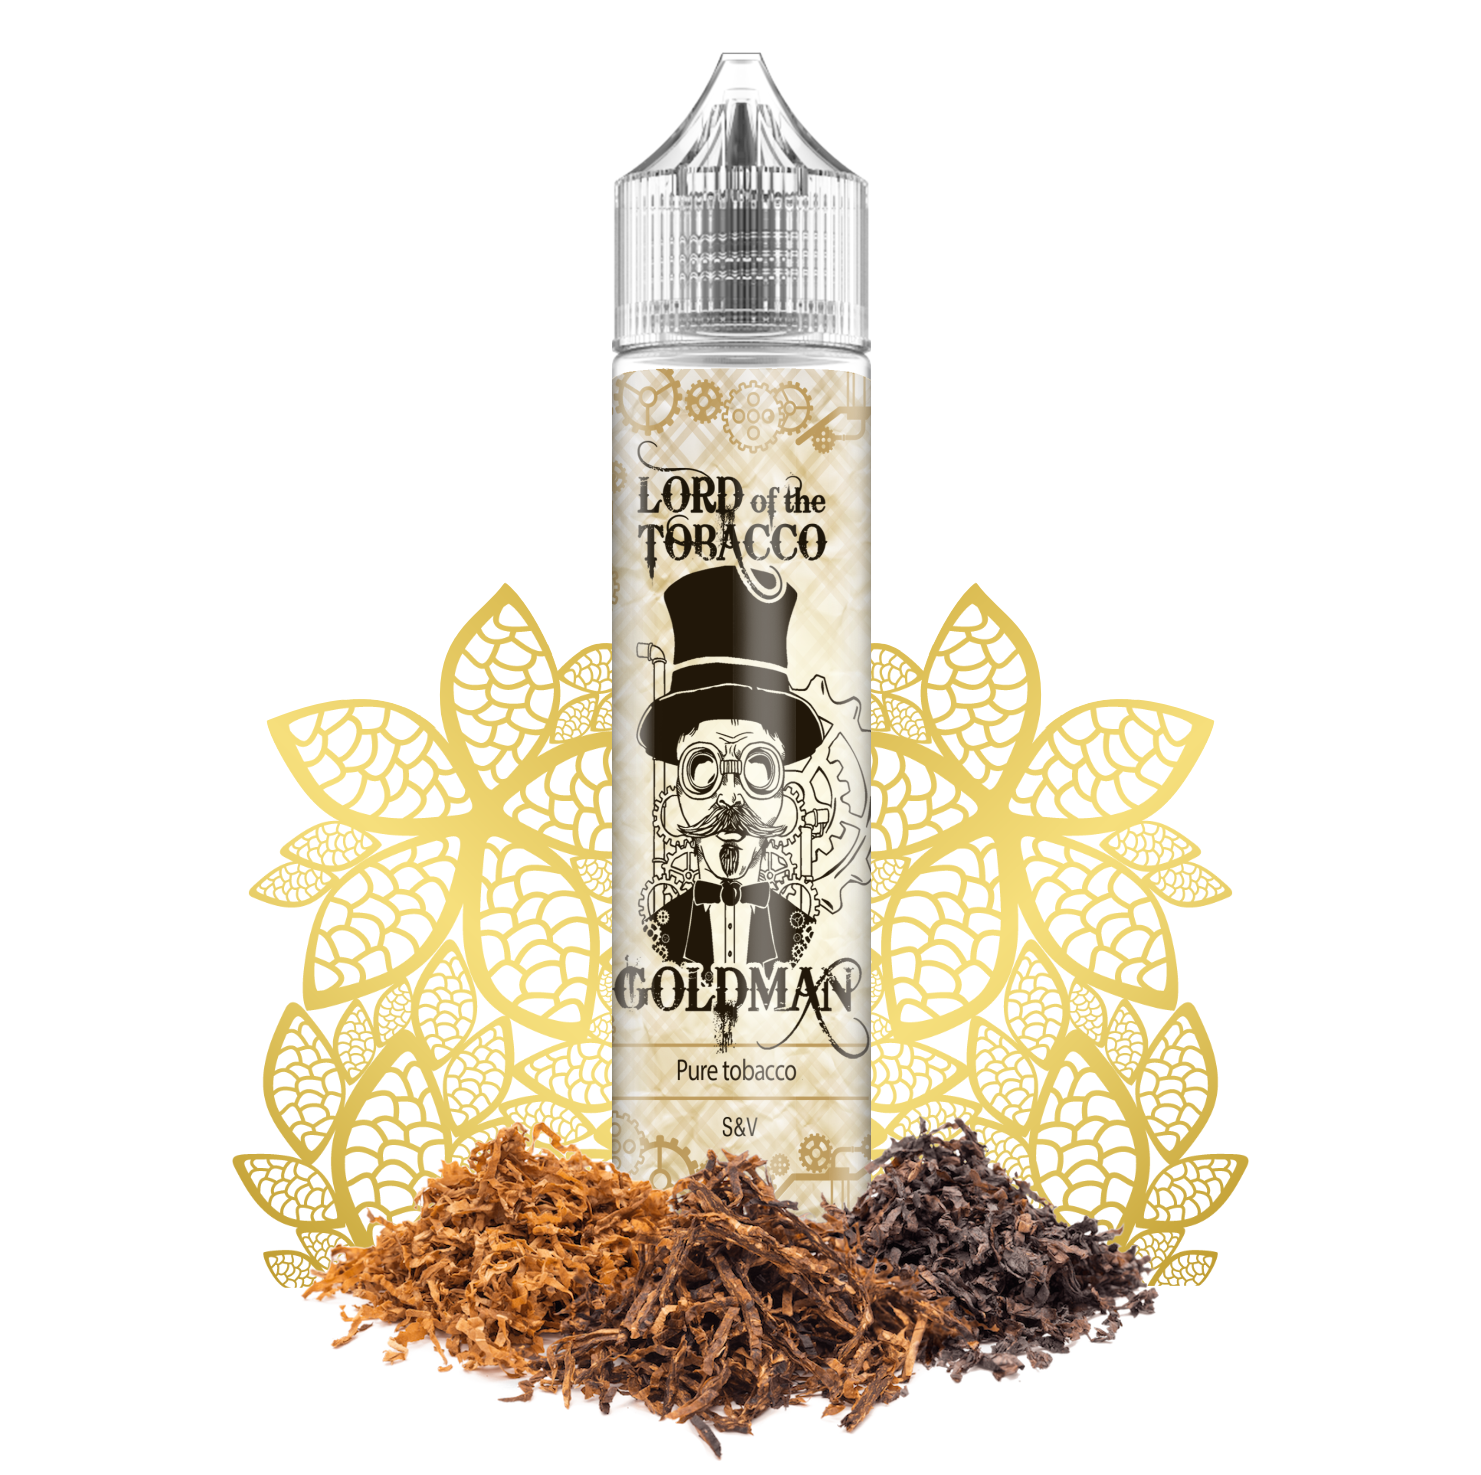 GOLDMAN / tabáková směs - Lord of the Tobacco shake&vape 12ml Dream Flavor